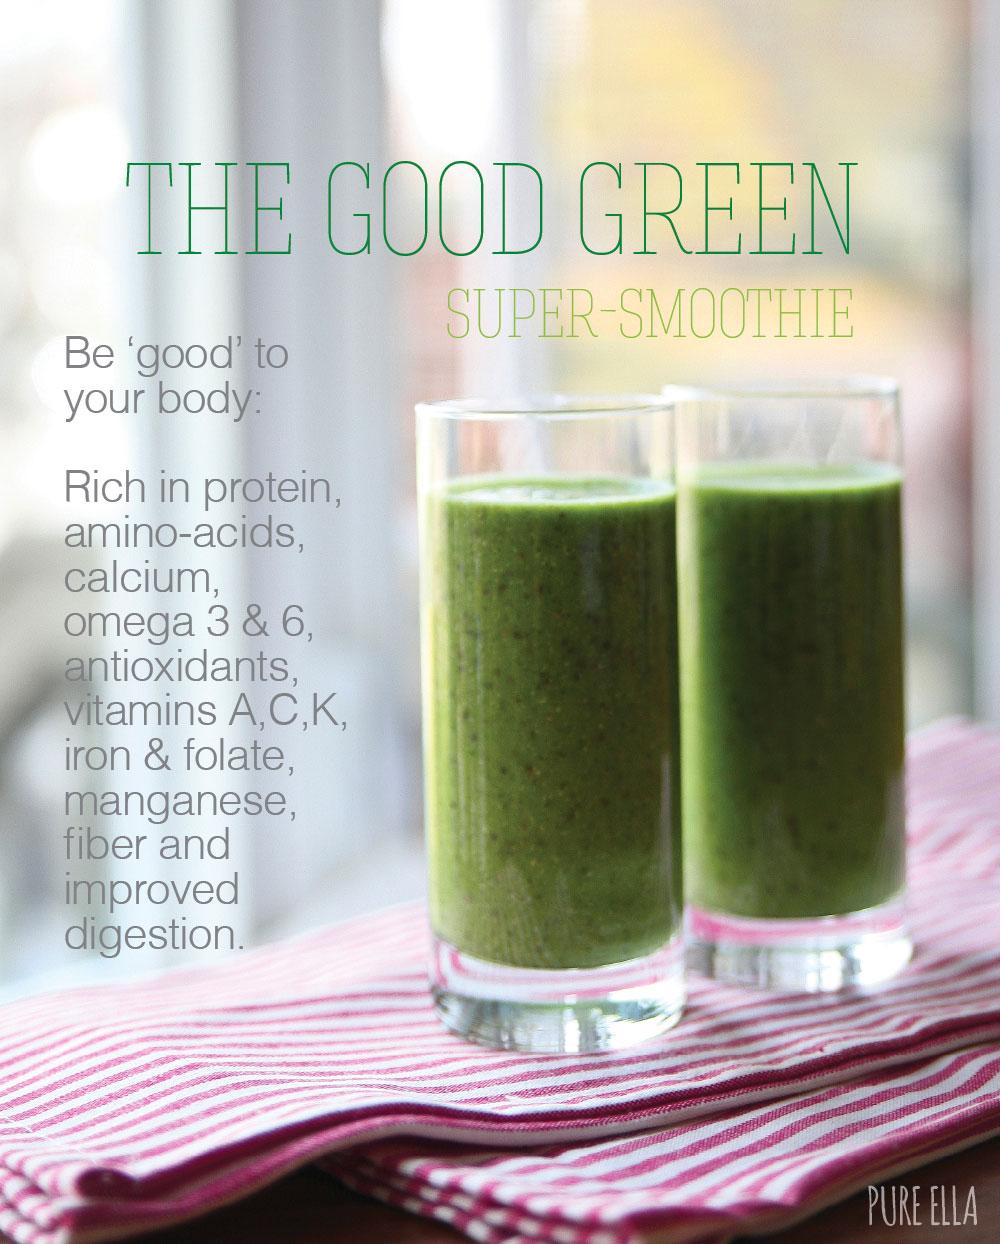 Pure-Ella-Good-Green-Super-Smoothie-vegan-gluten-free-protein-and-probiotic-smoothie3